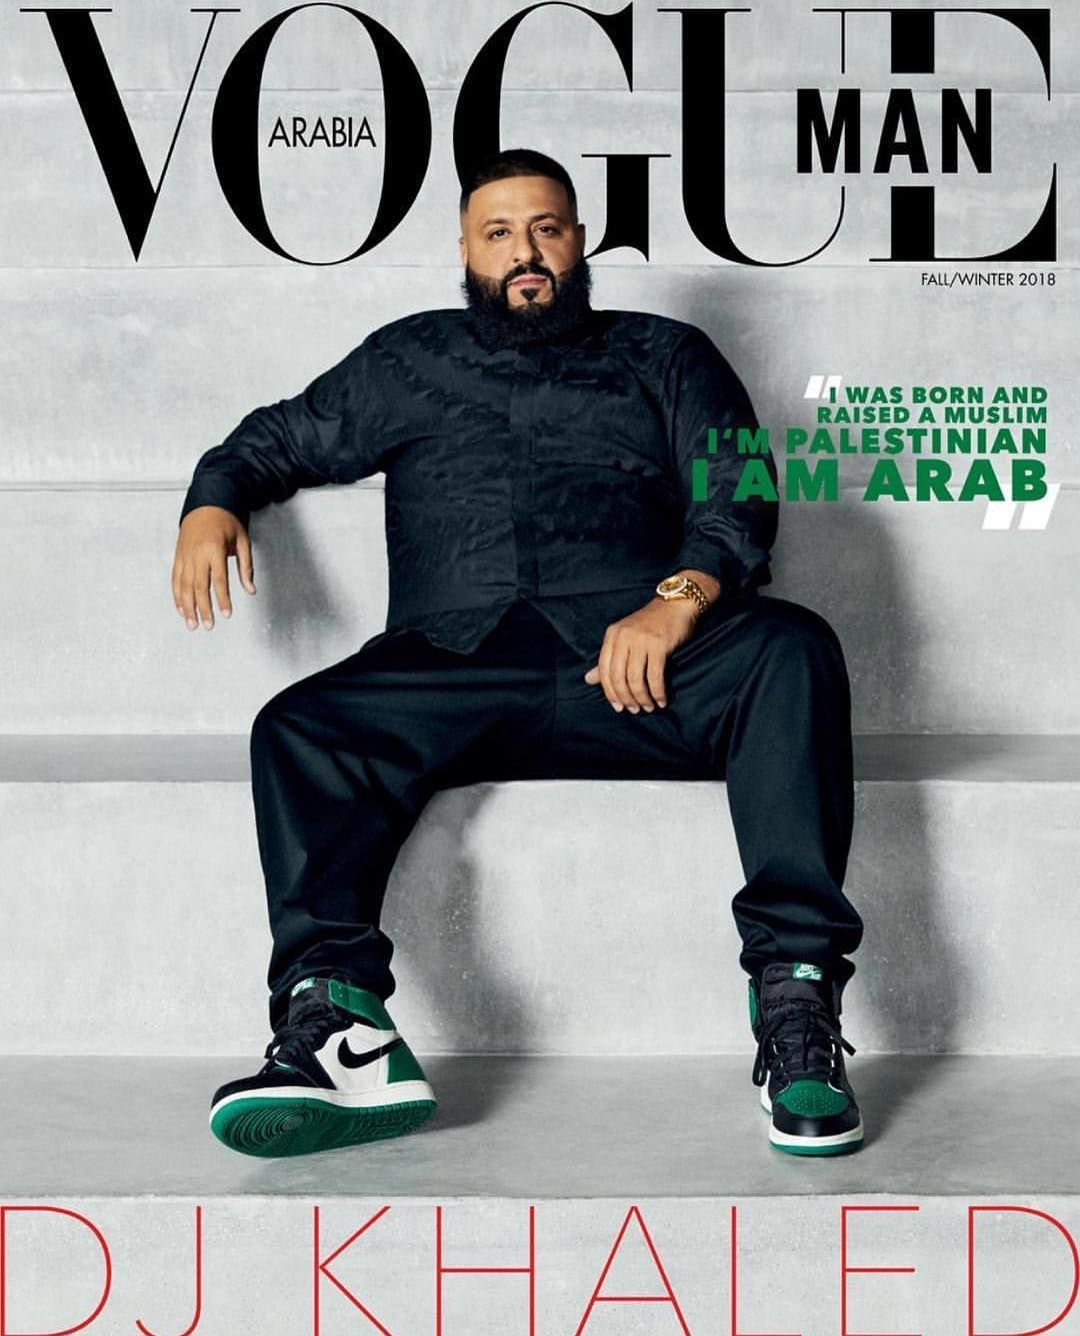 510ebb5eebb994 DJ Khaled for Vogue Man Magazine Arabia Fall 2018